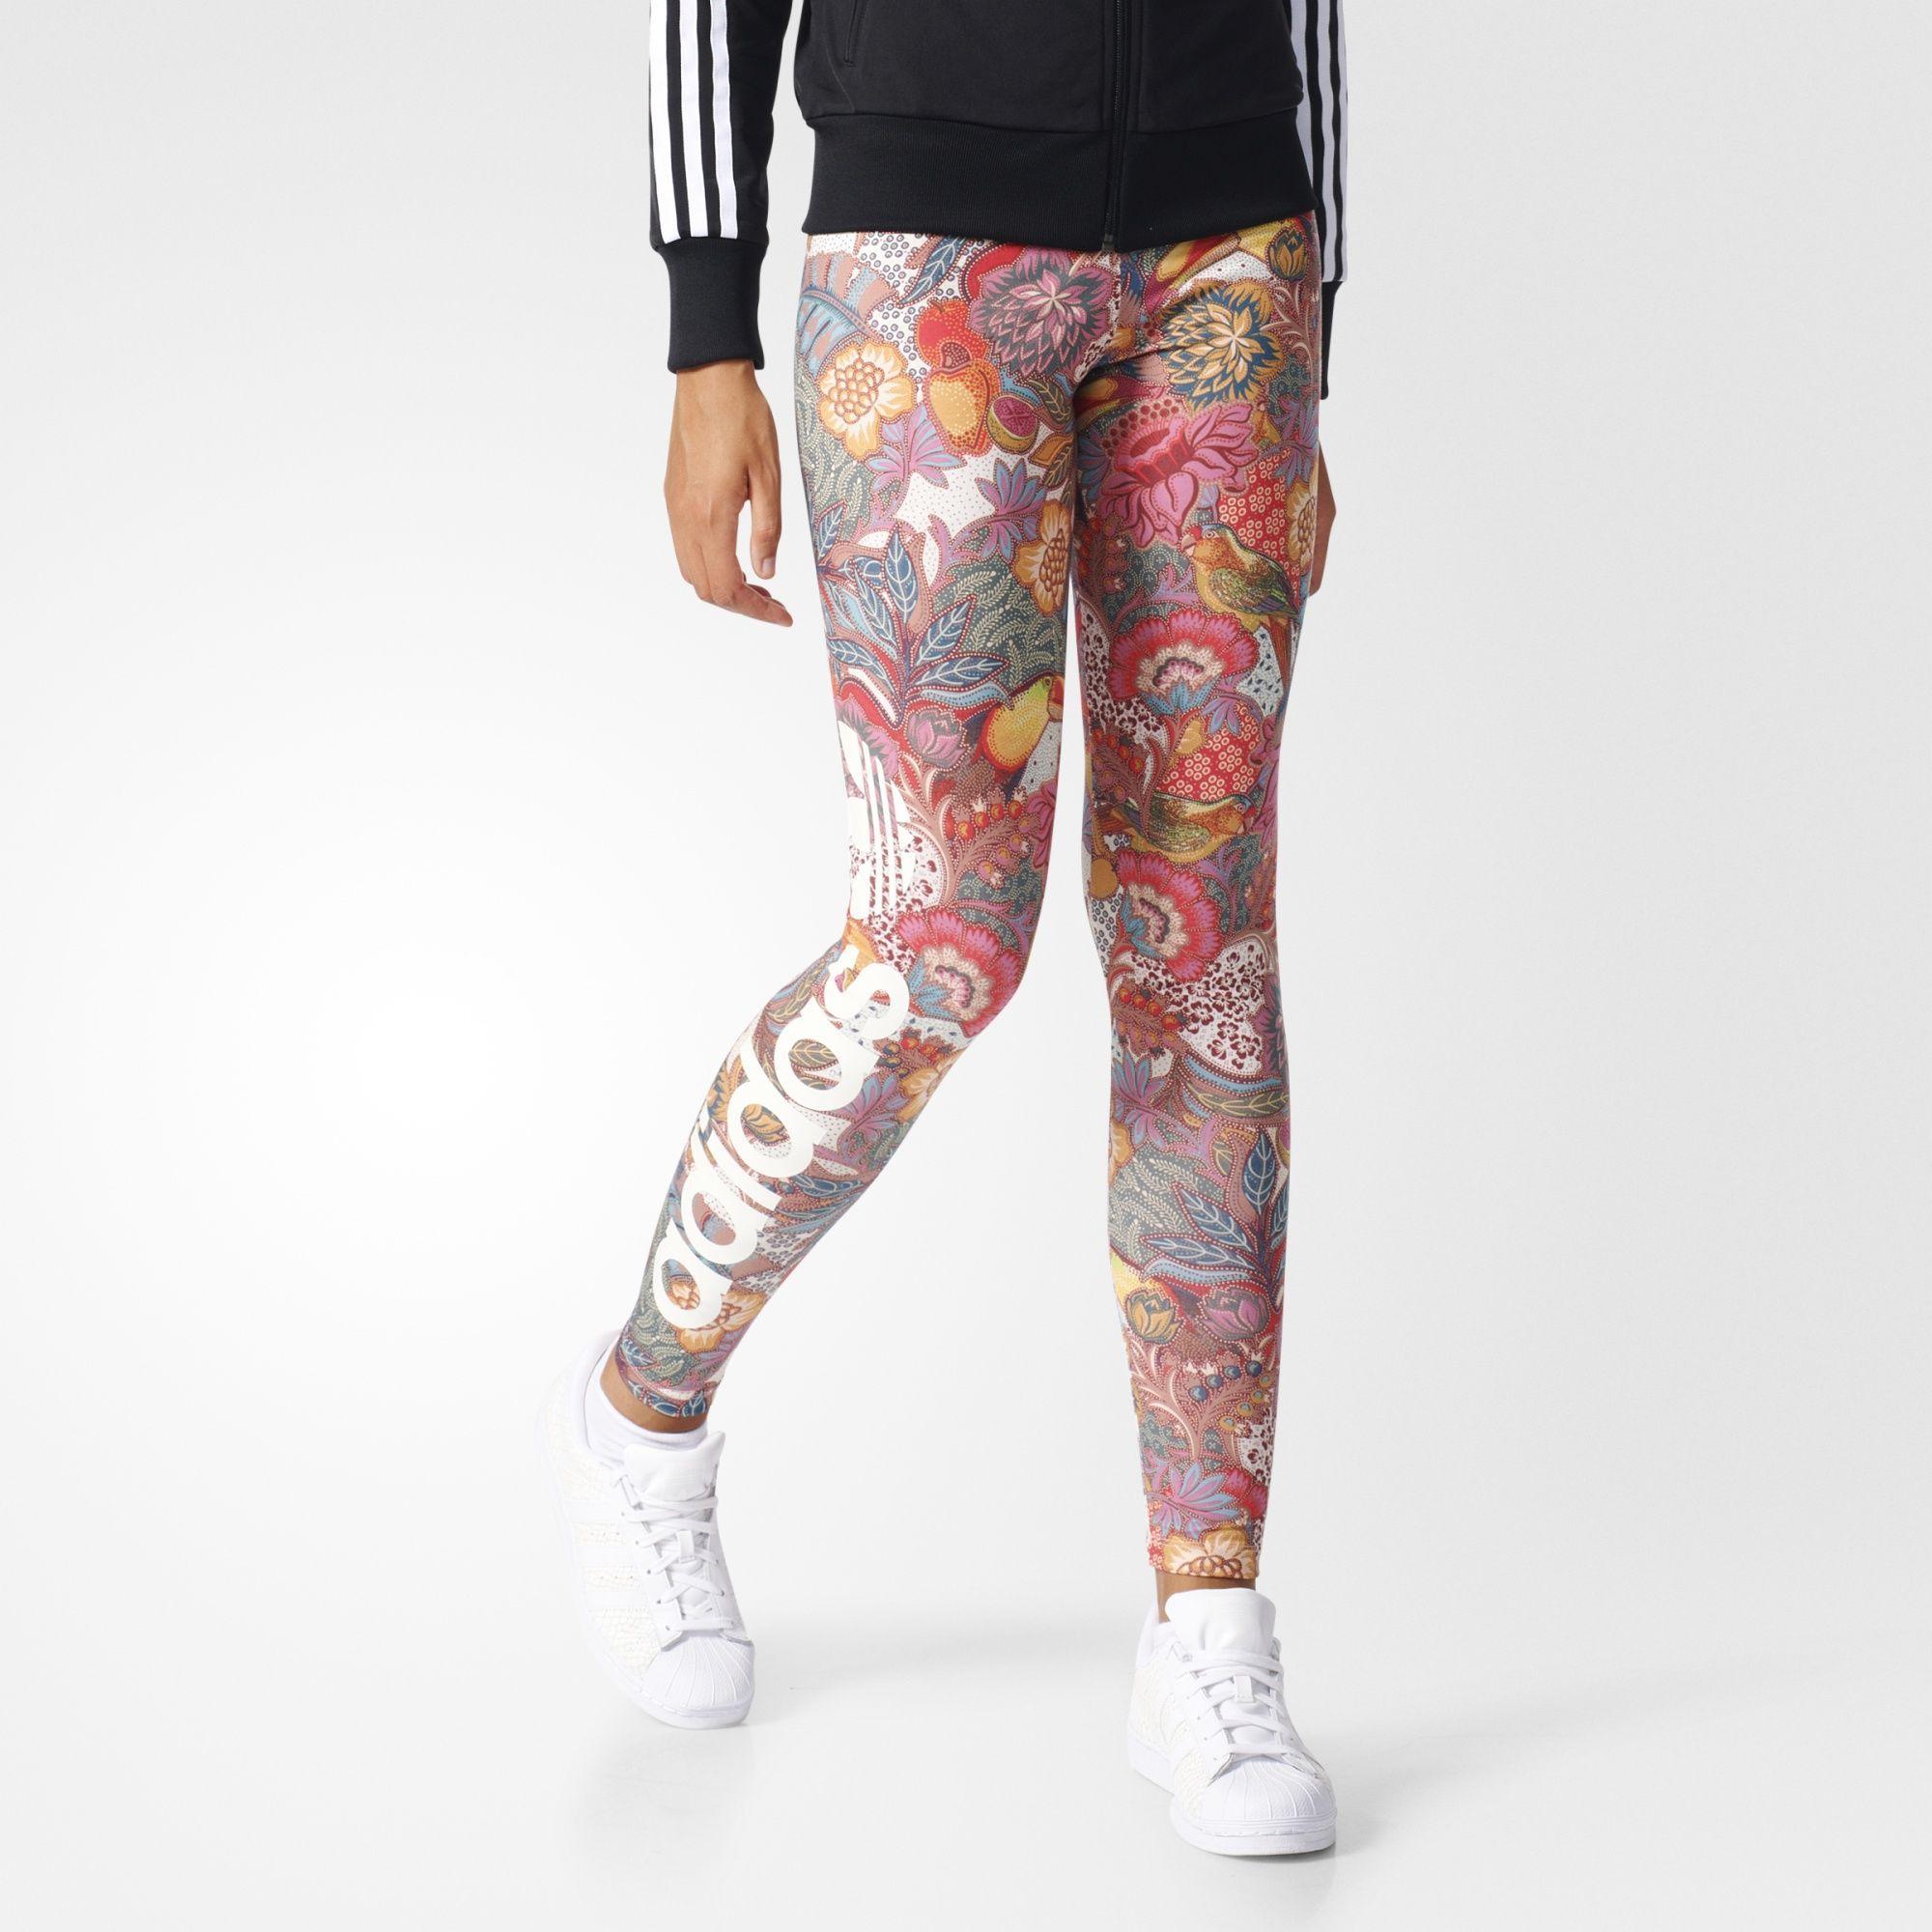 adidas - Fugiprabali Linear Leggings  9a0c0d8fa4c